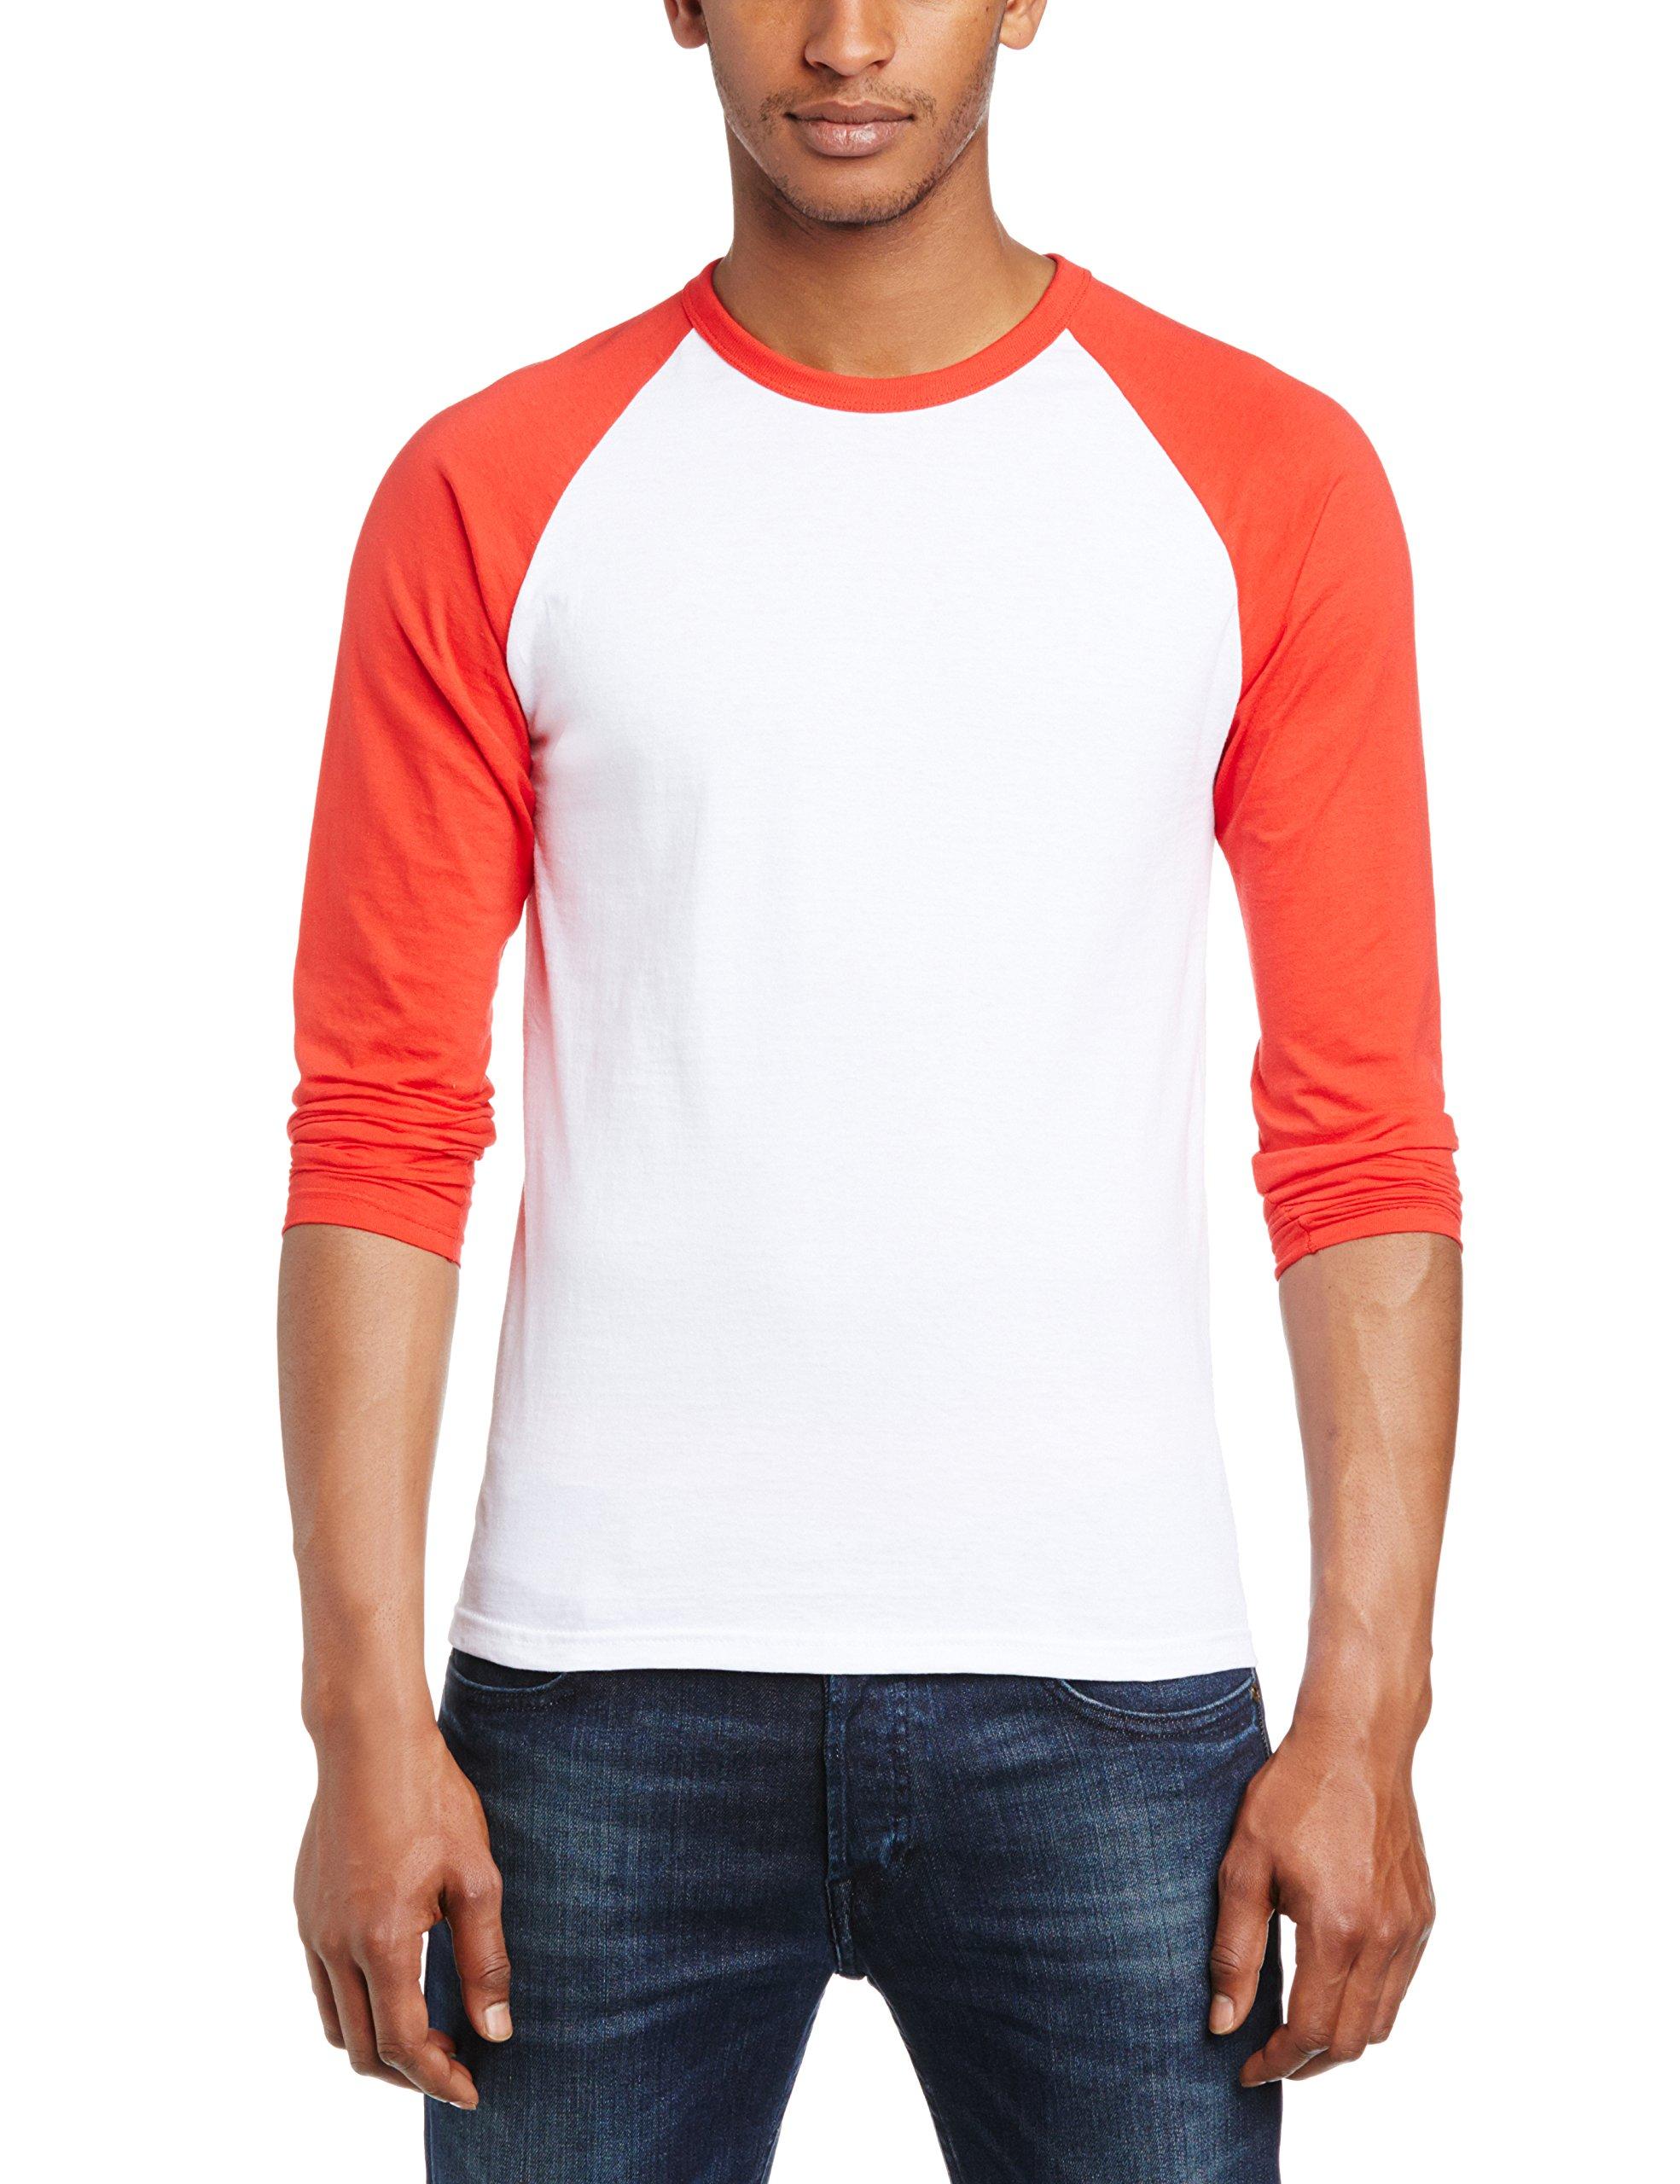 Fruit of the Loom Mens Long Sleeve Baseball T-Shirt (XL) (White/Red)